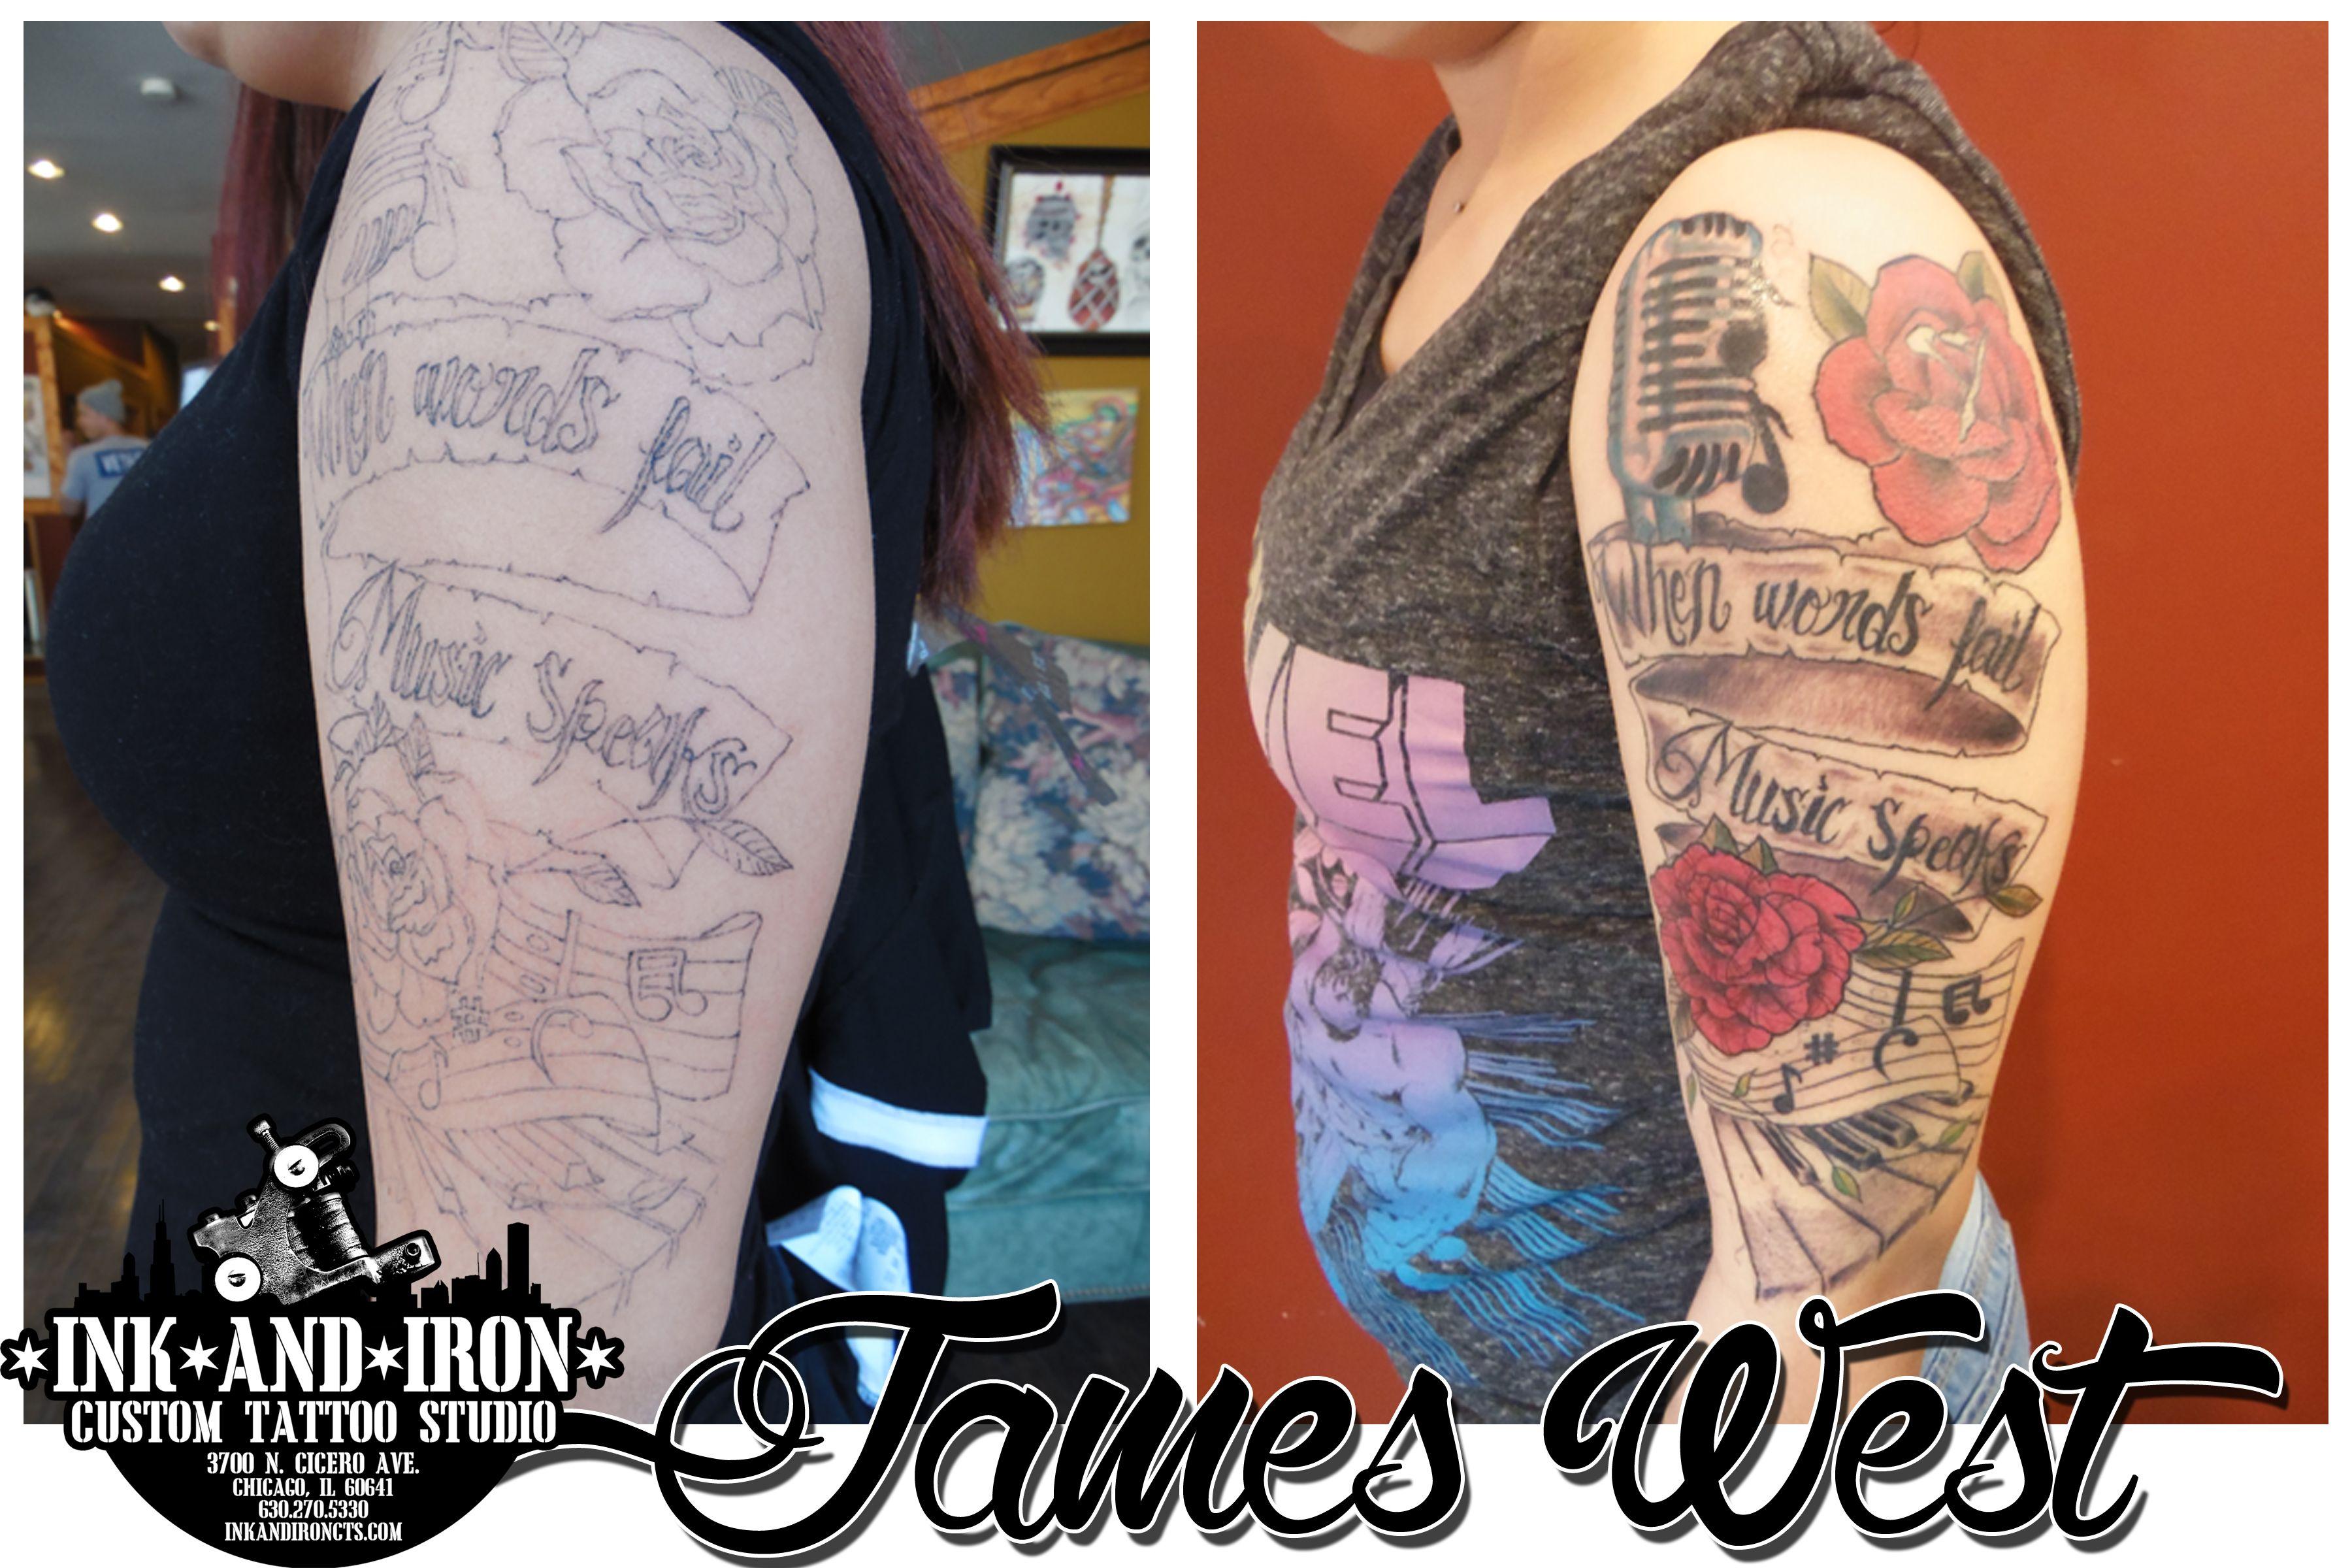 Ink and iron custom tattoo studio tattoo studio custom